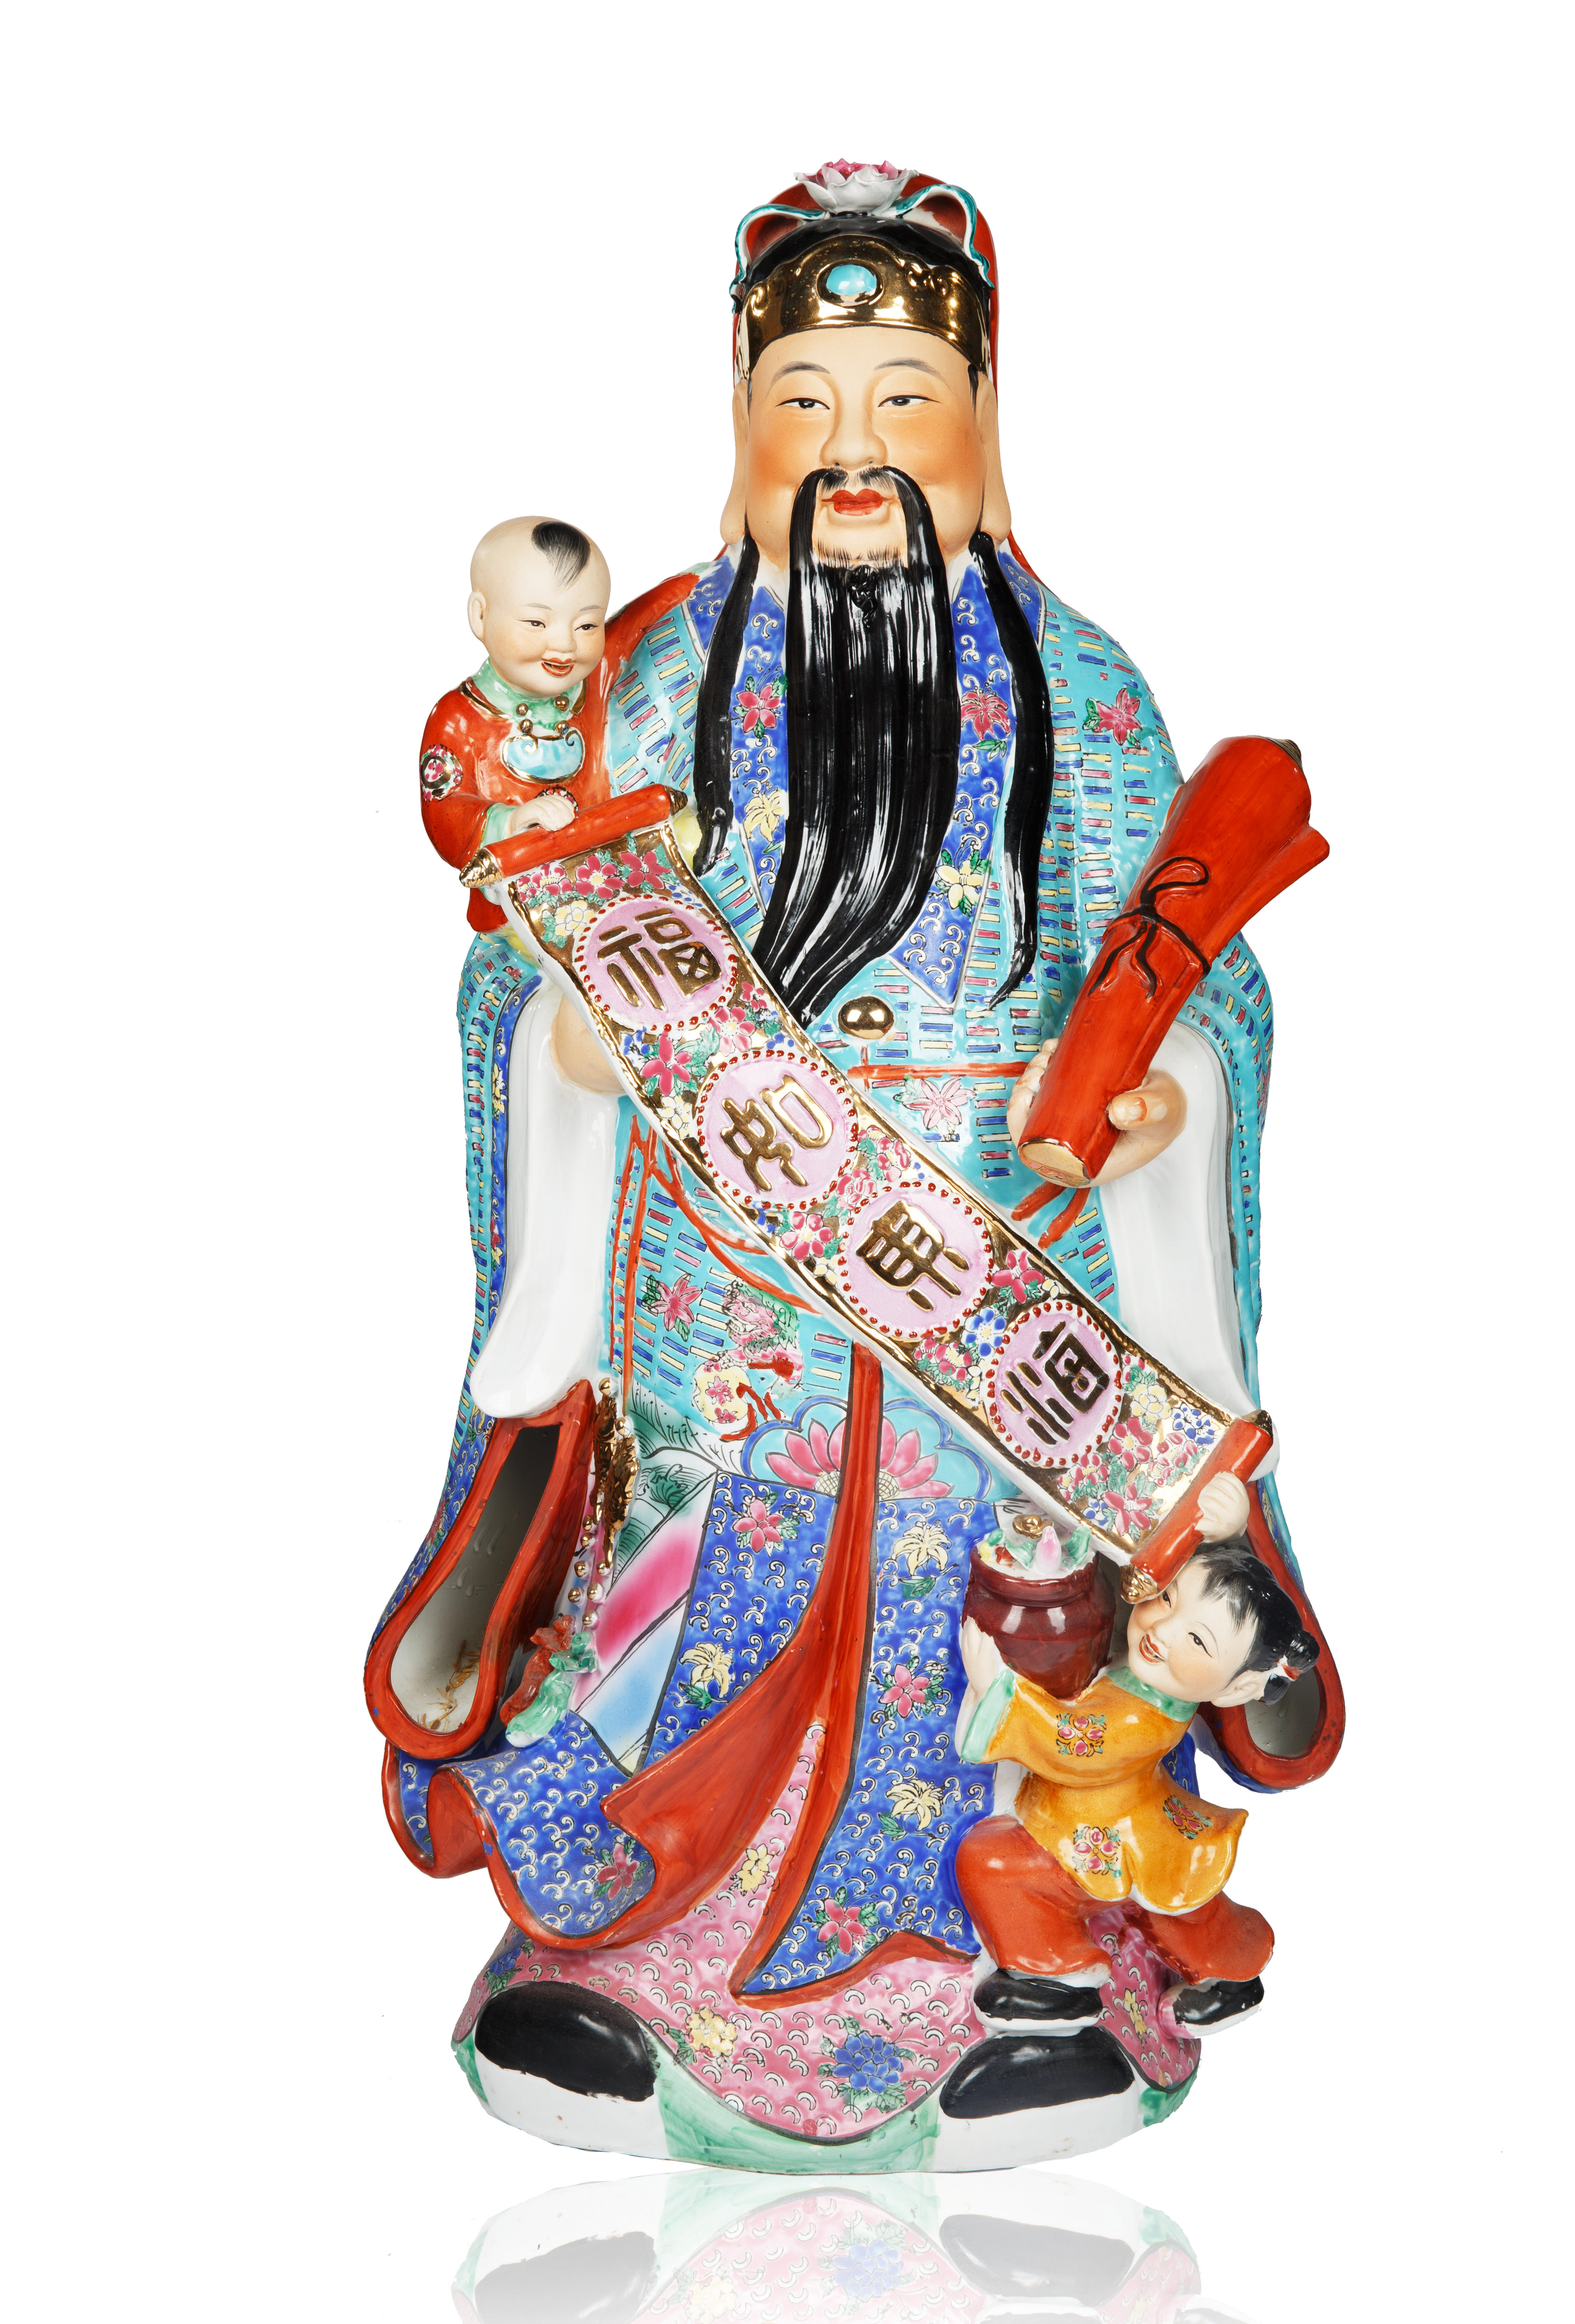 LARGE CHINESE PORCELAIN 'WISE MAN' OF PROSPERITY [FU] FIGURINE